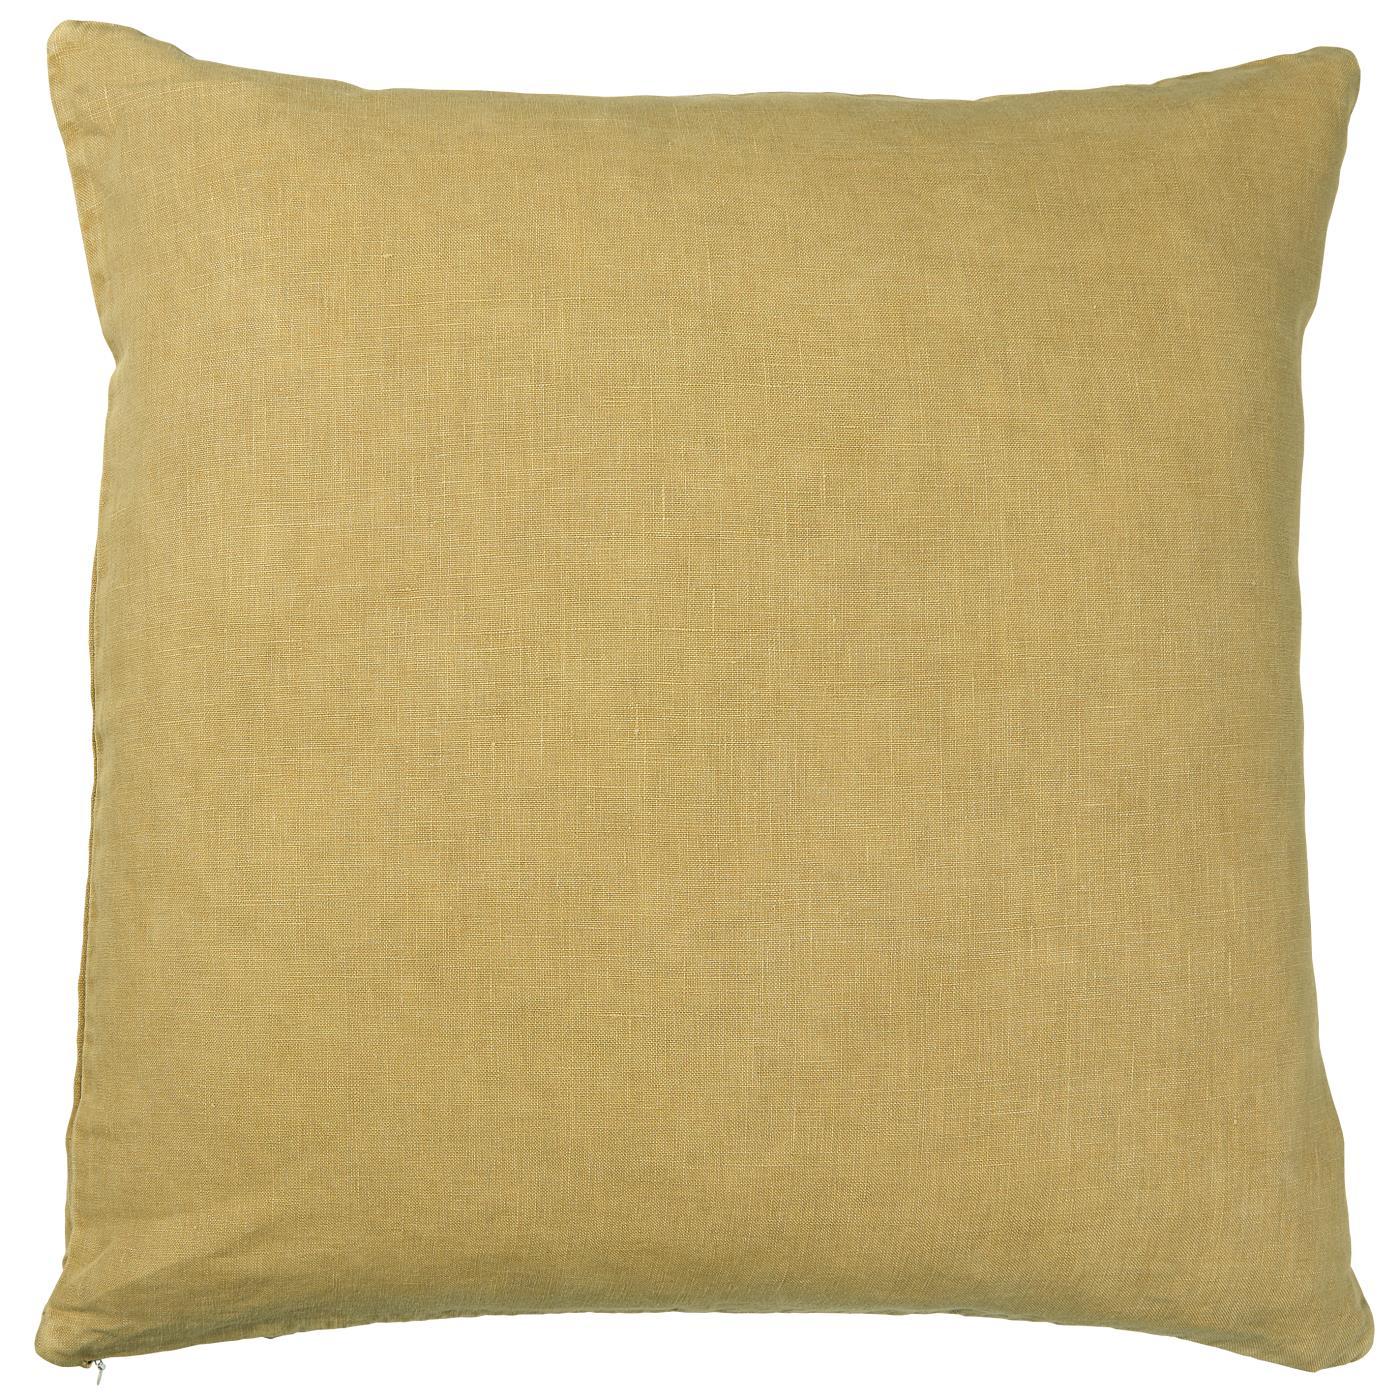 Kissenbezug Leinen gelb 50x50cm